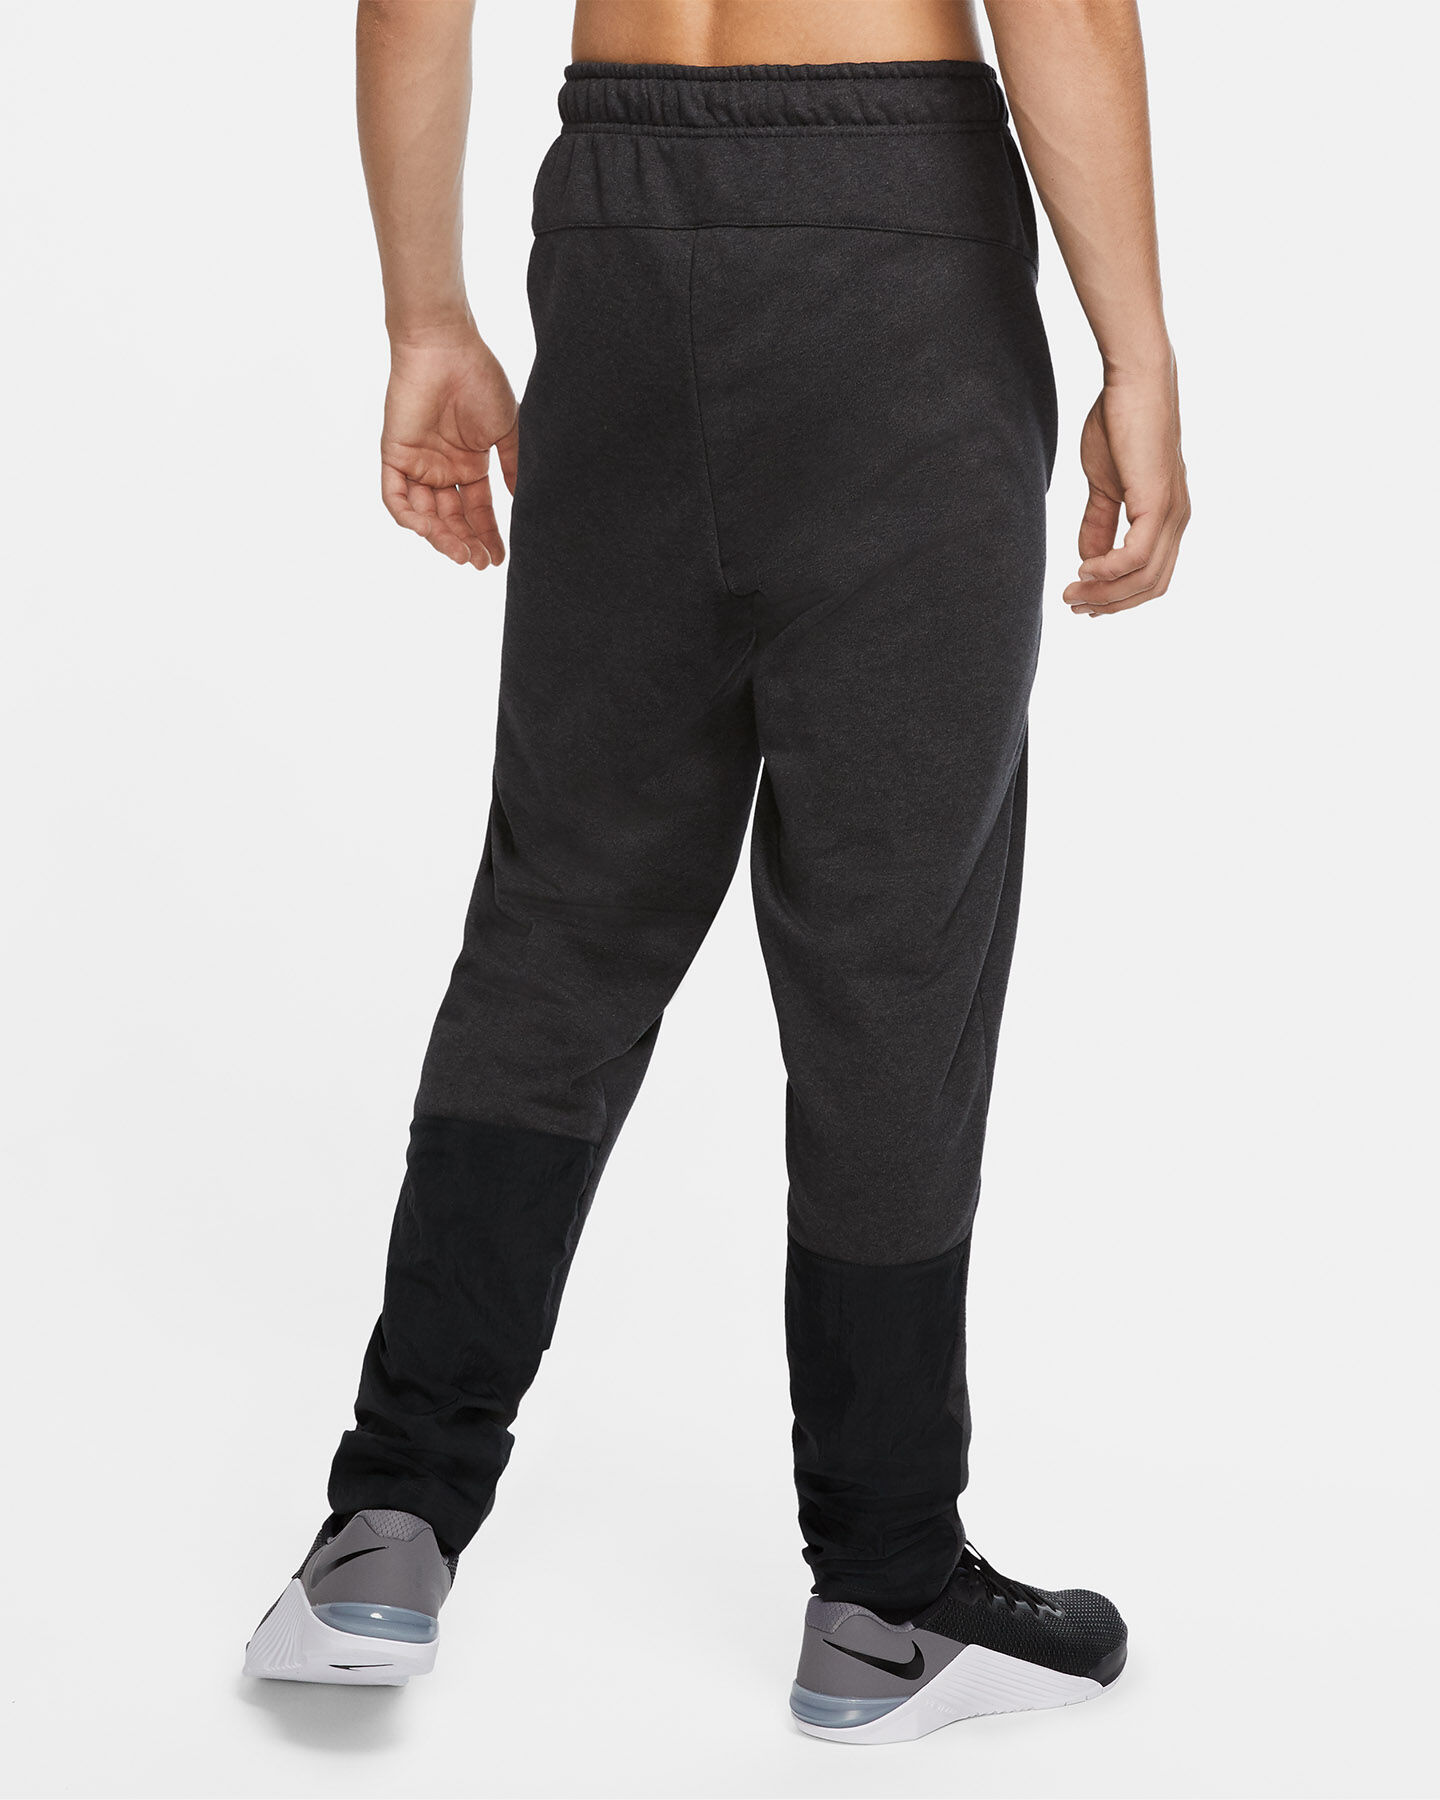 Pantalone training NIKE DRI-FIT M S5225654 scatto 3